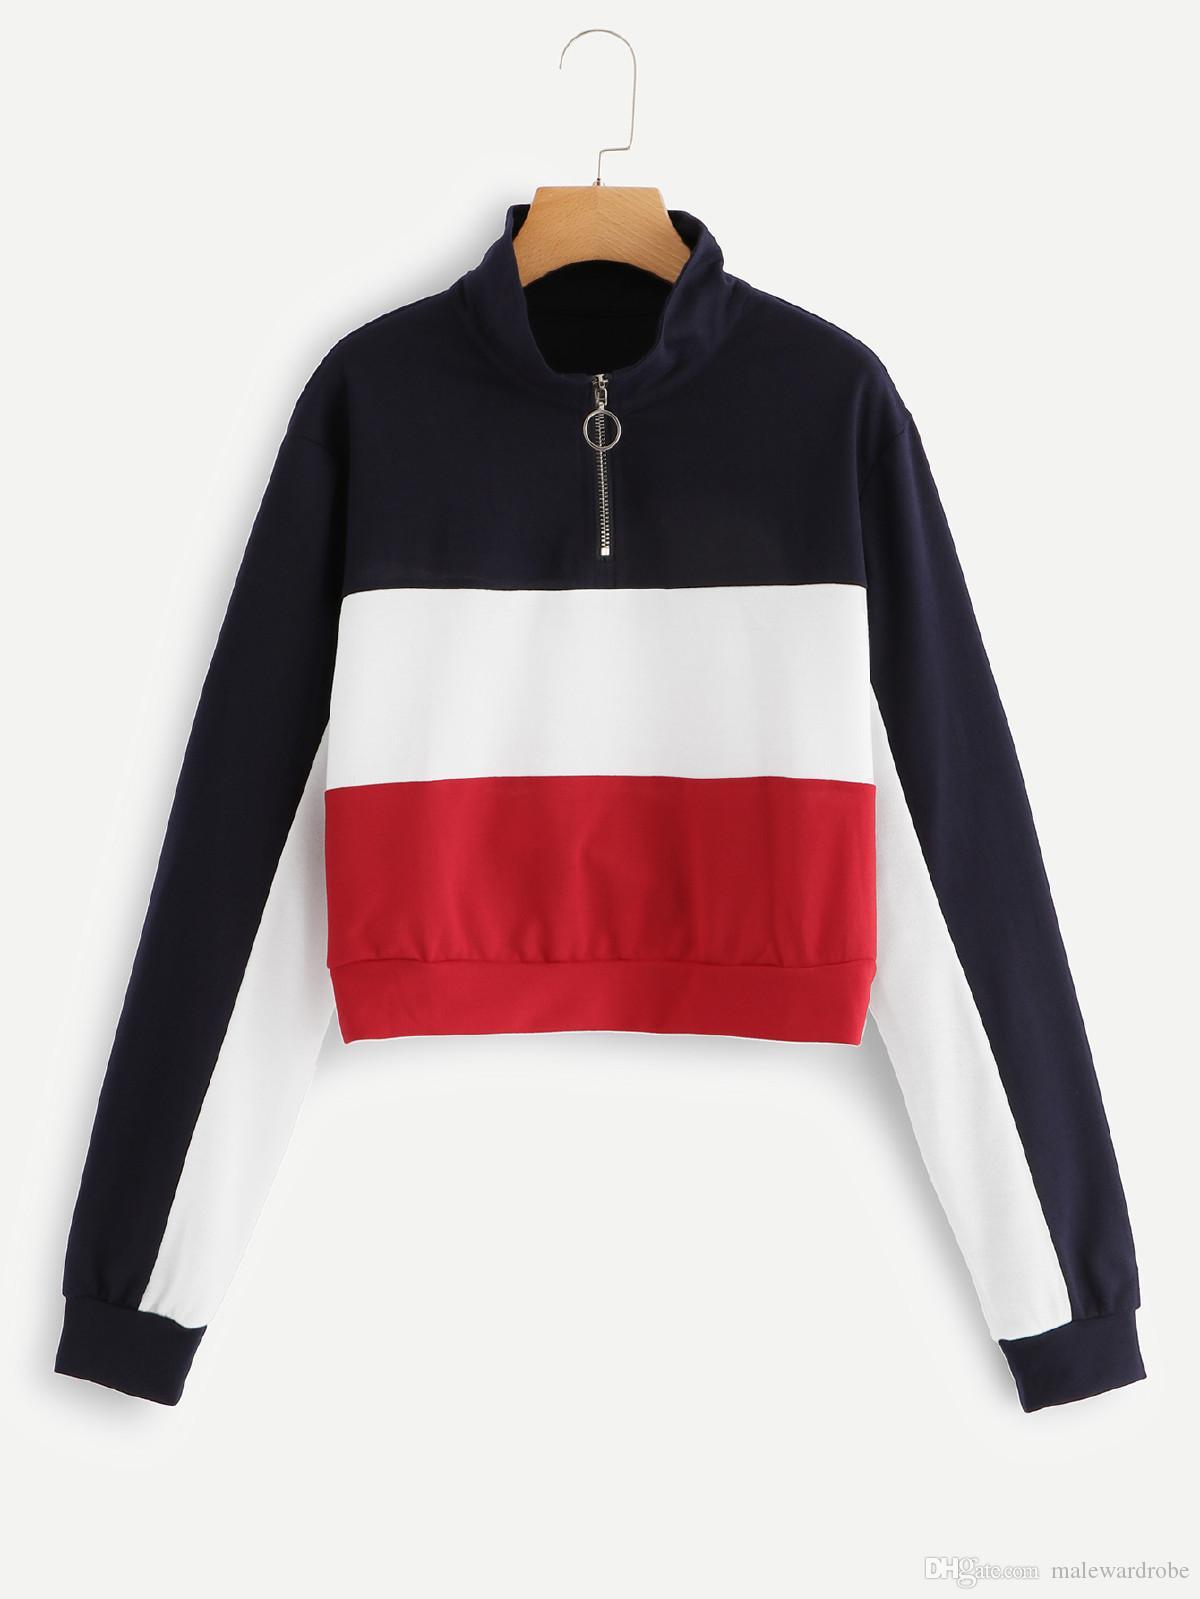 Donne Patchwork Zip Up Felpa Crop Tops Turn-Giù colletto a maniche lunghe Streetwear autunno femminile Felpe Casual